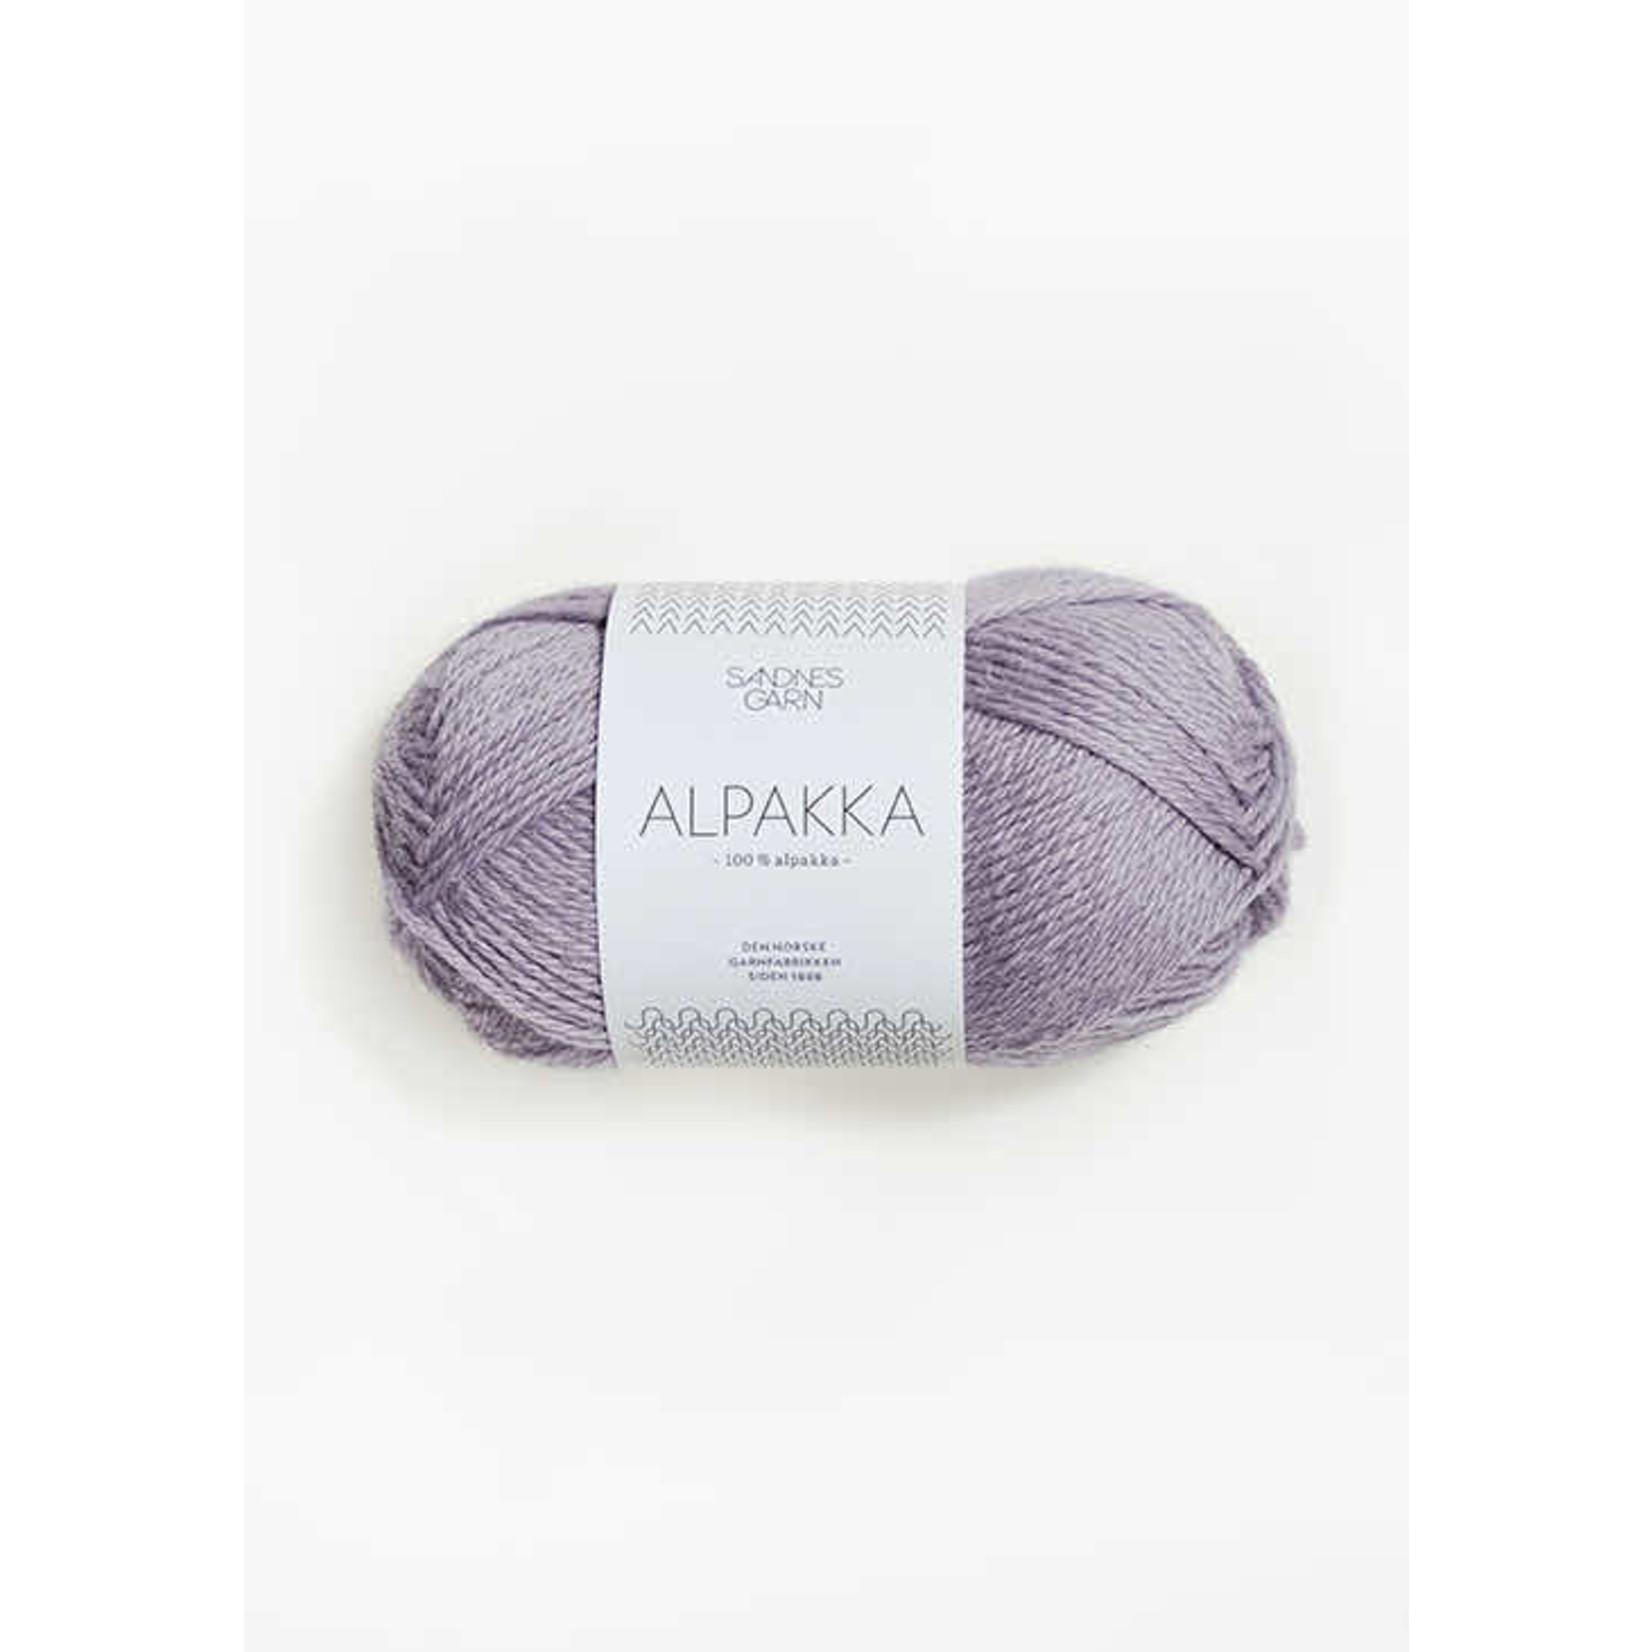 Sandnes Garn Alpakka, 4631, Dusty Lilac